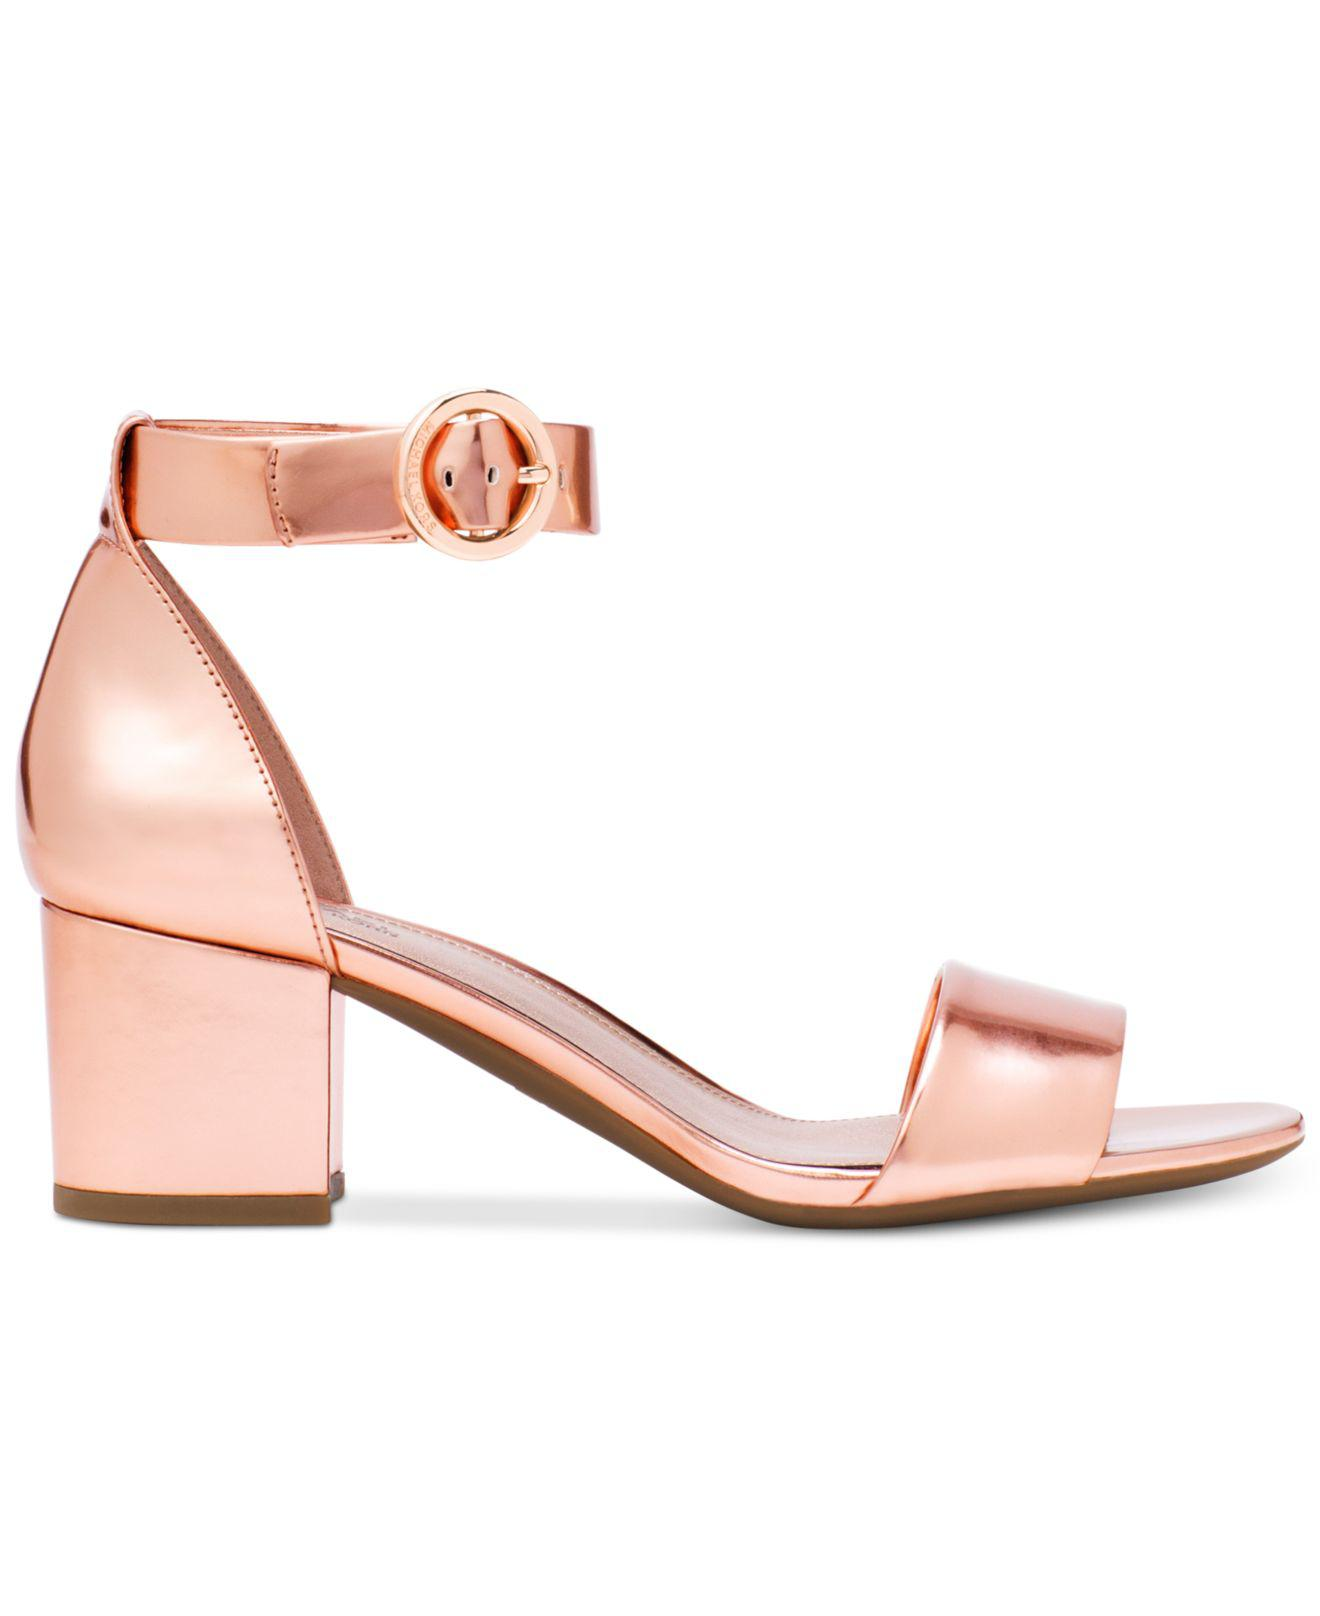 9f935465a36 Michael Kors Michael Lena Block Heel Dress Sandals in Pink - Lyst